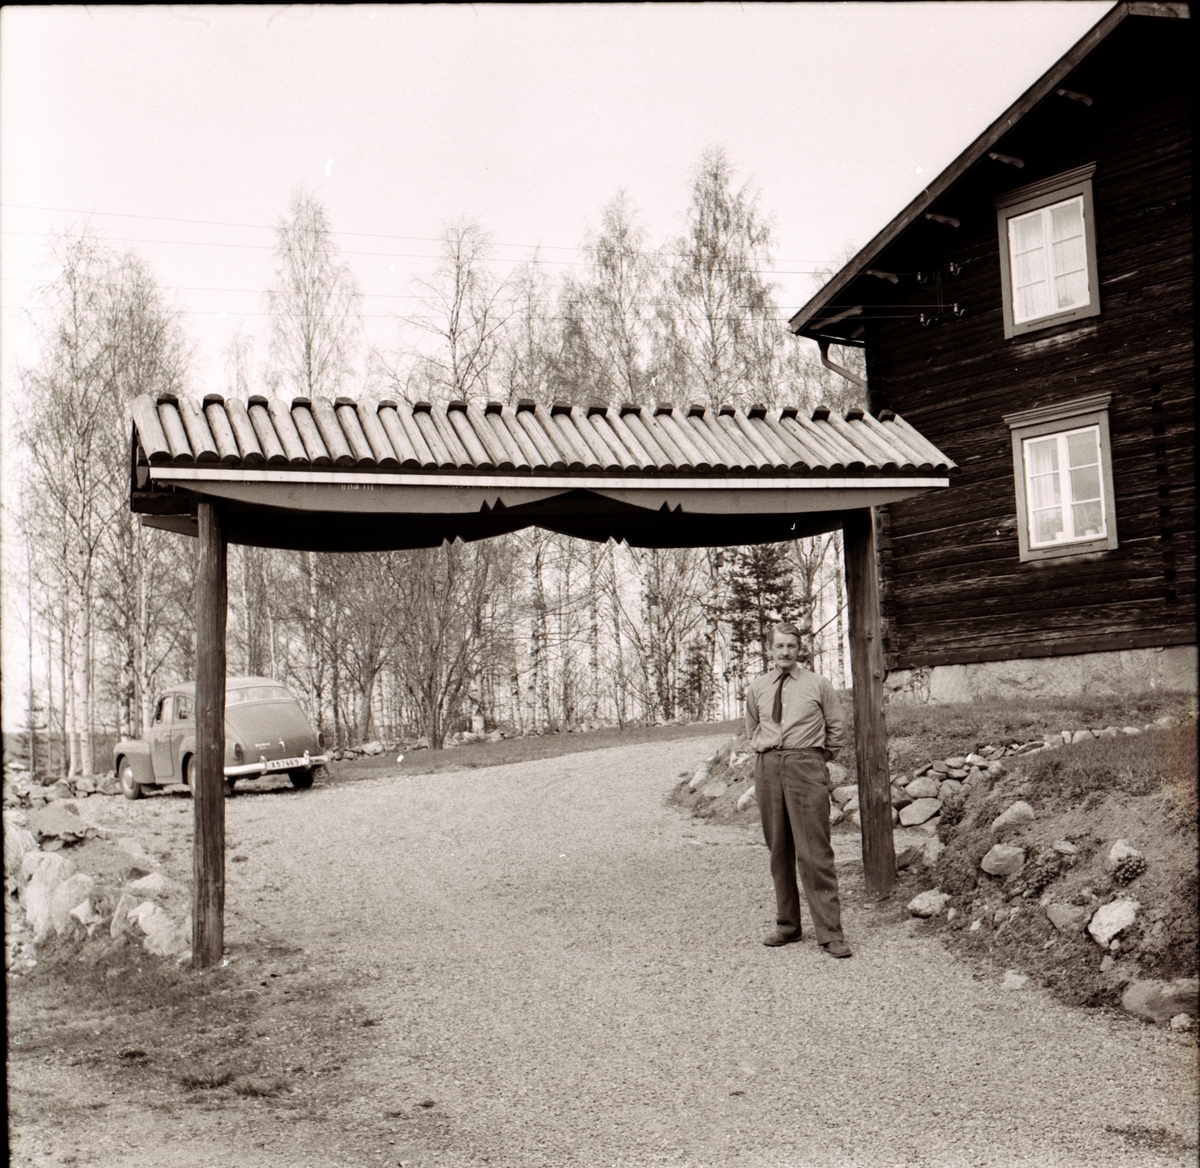 Runemo, Abrahamsson Axel, Styckjunkare, 12 Maj 1965